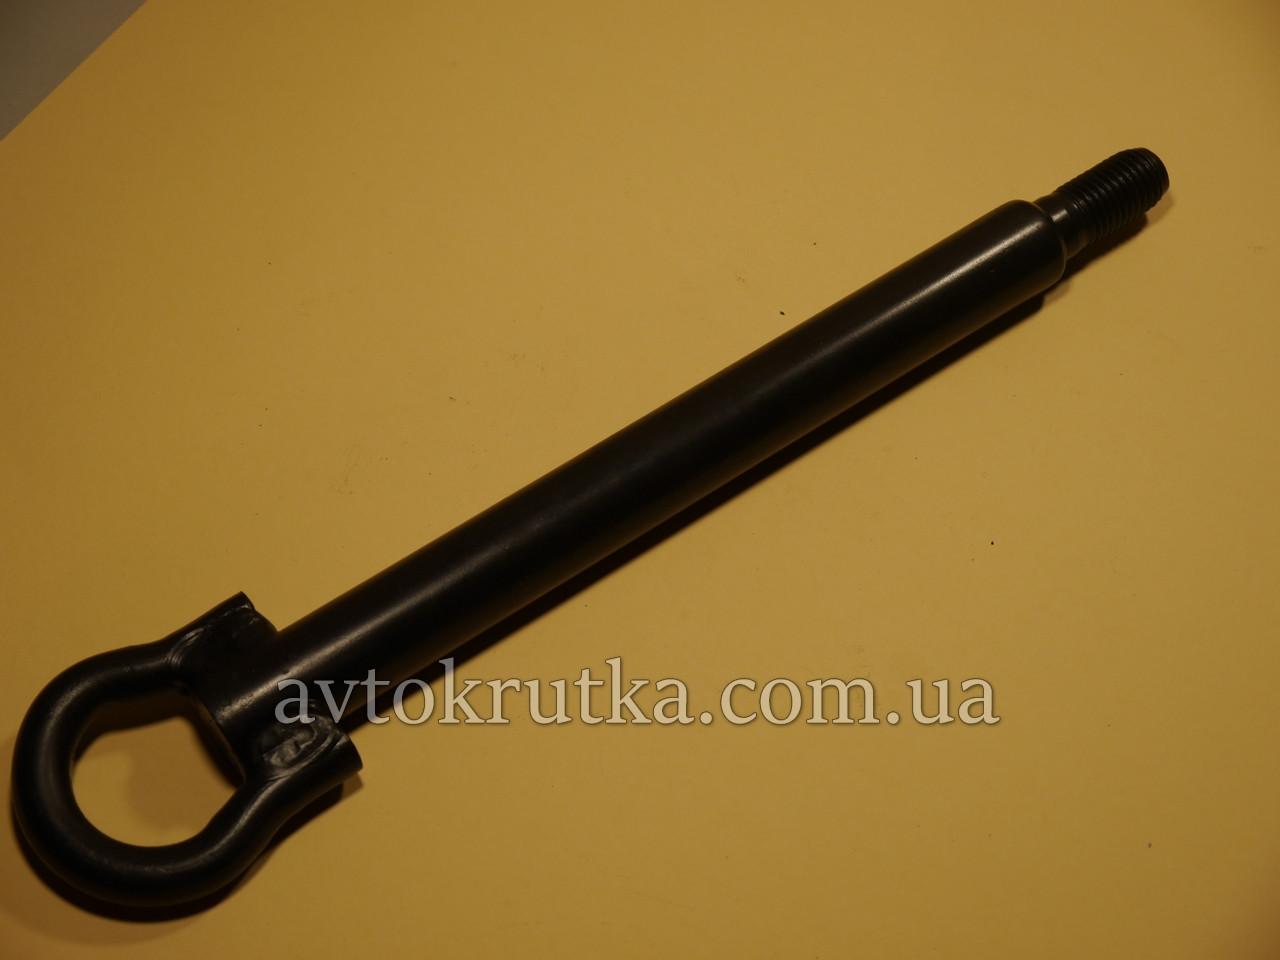 Буксировочный крюк Renault Megane 3 (Рено Меган 3) 511120006R